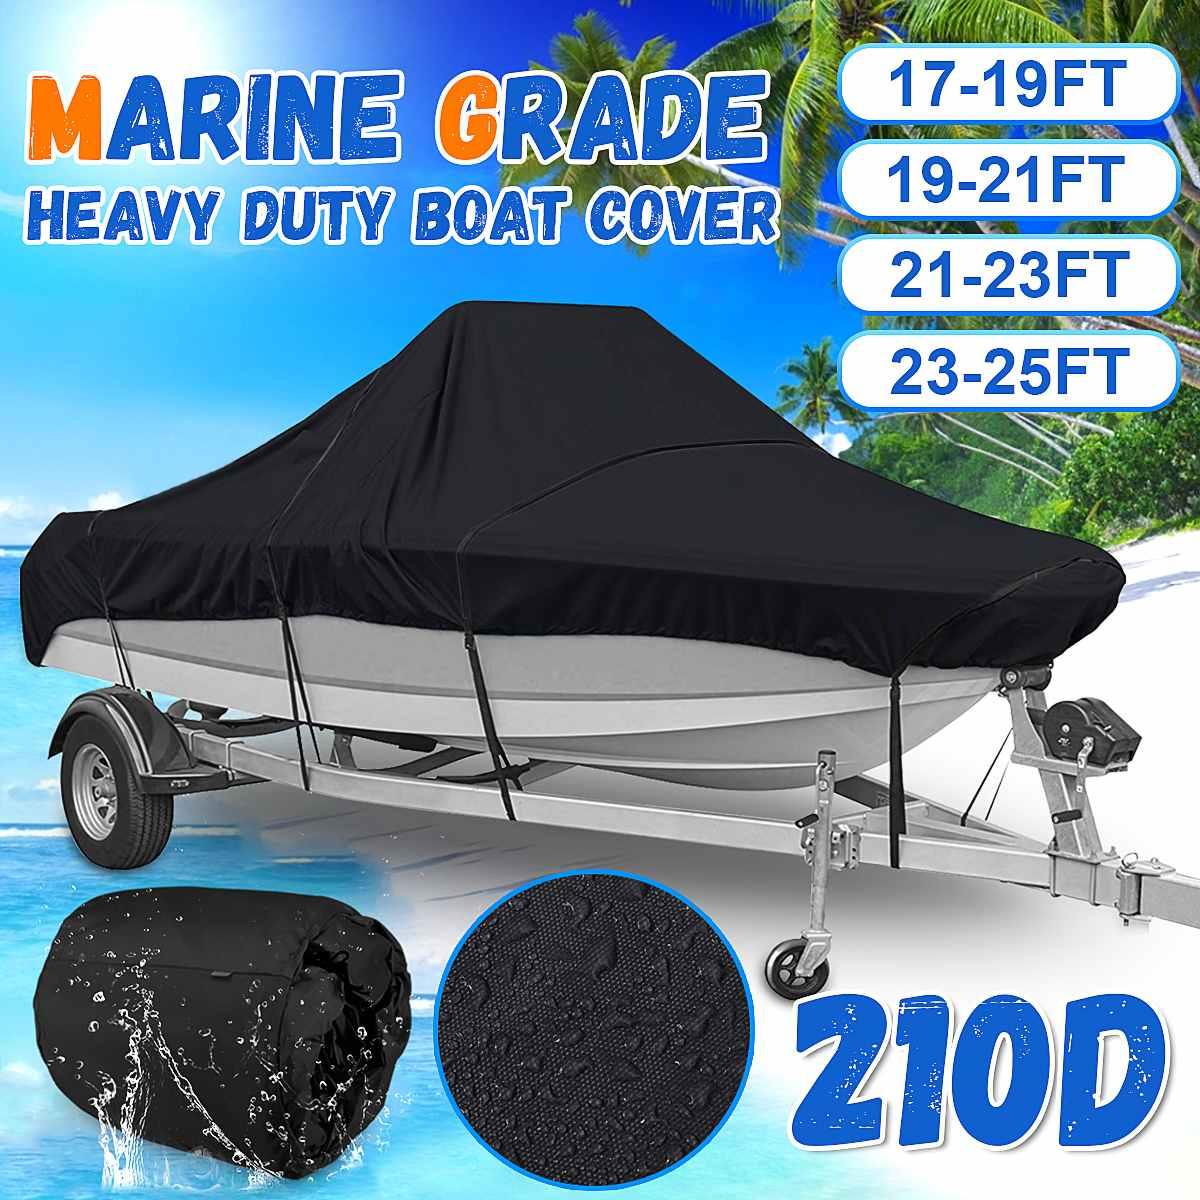 17-25FT Marine Grade 210D Trailerable Boat Cover Waterproof Fish-Ski V-Hull Sunproof UV Protector Boat Mooring Cover